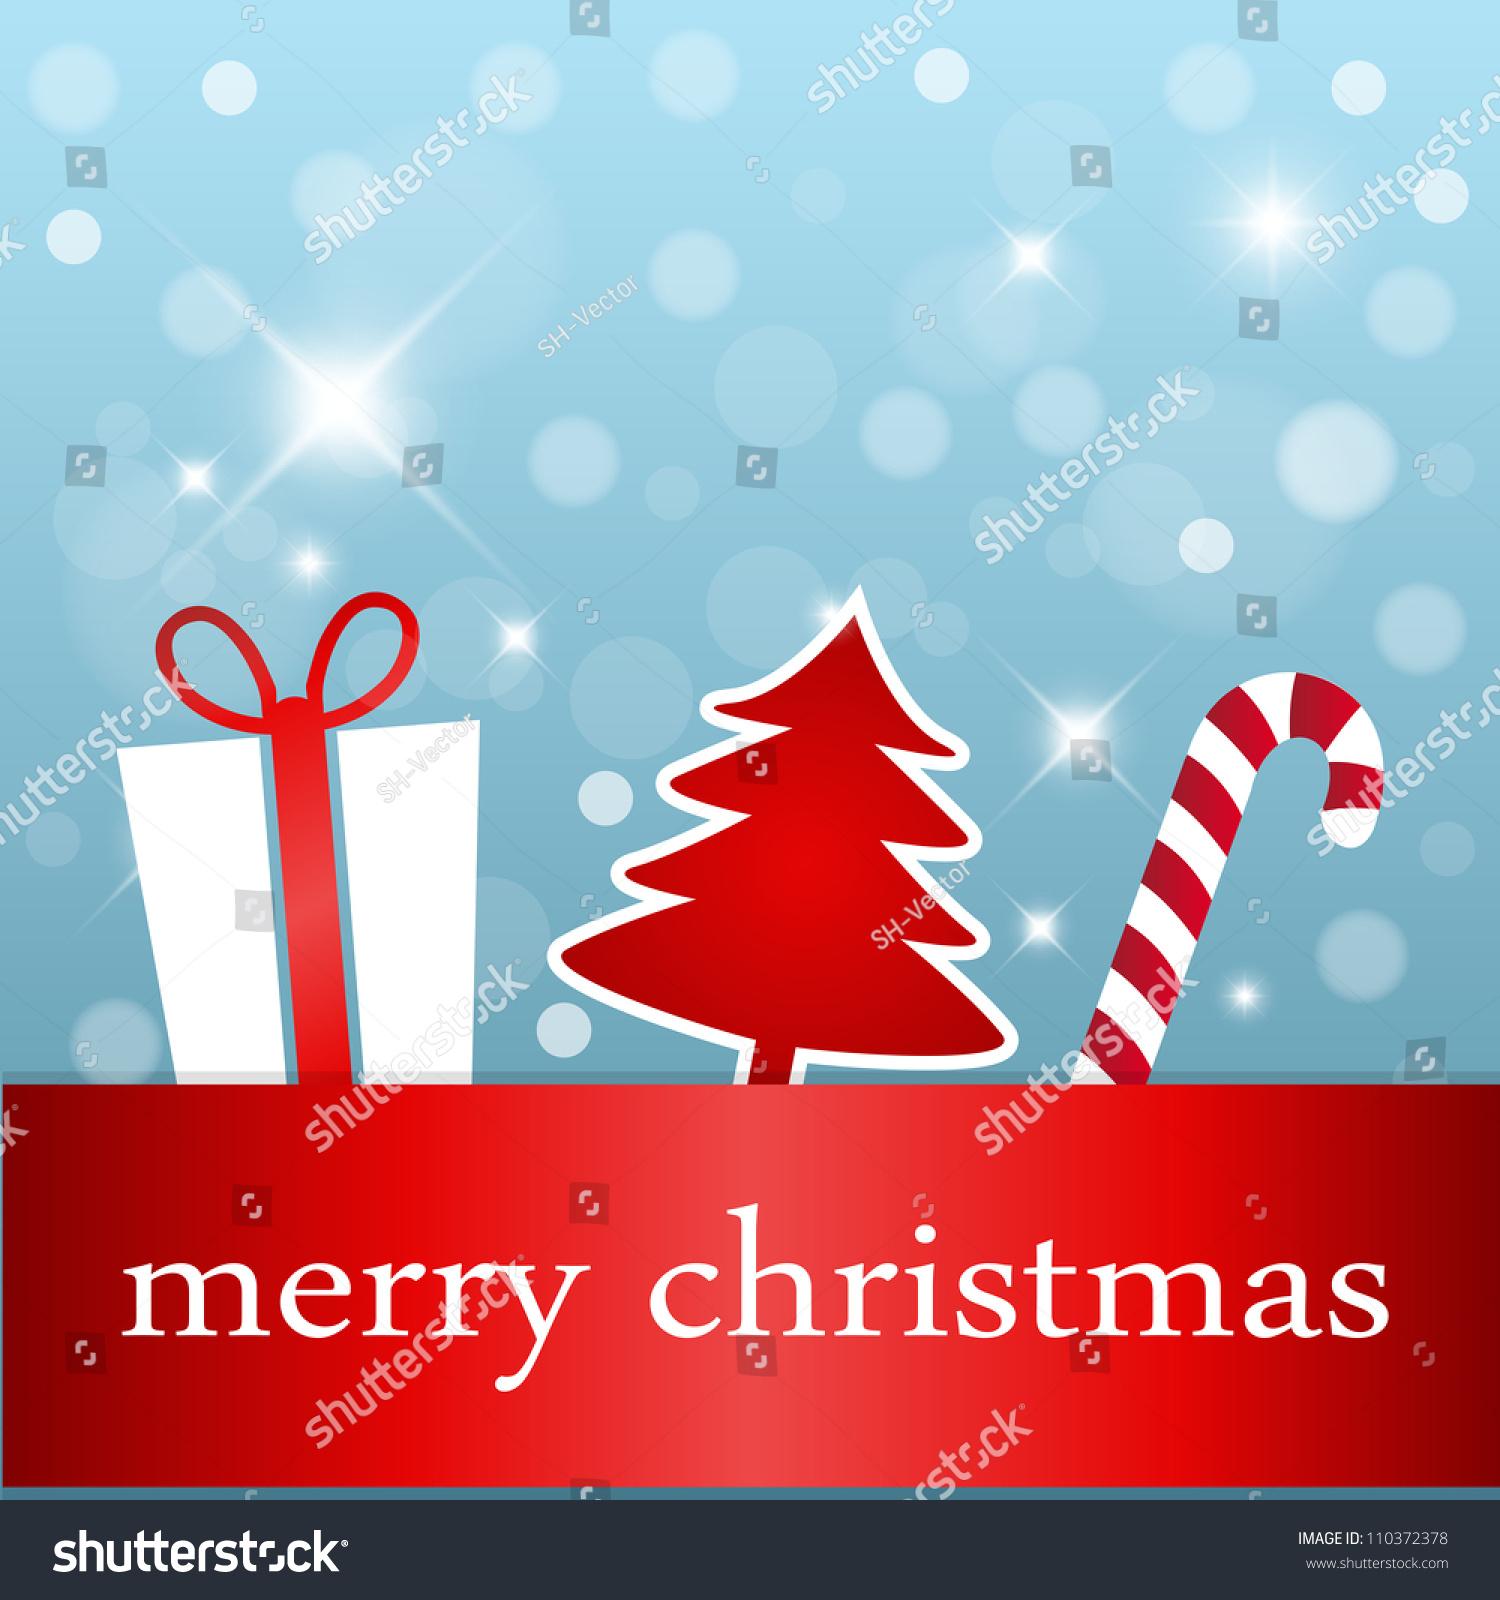 Creative Christmas Card Stock Vector Royalty Free 110372378